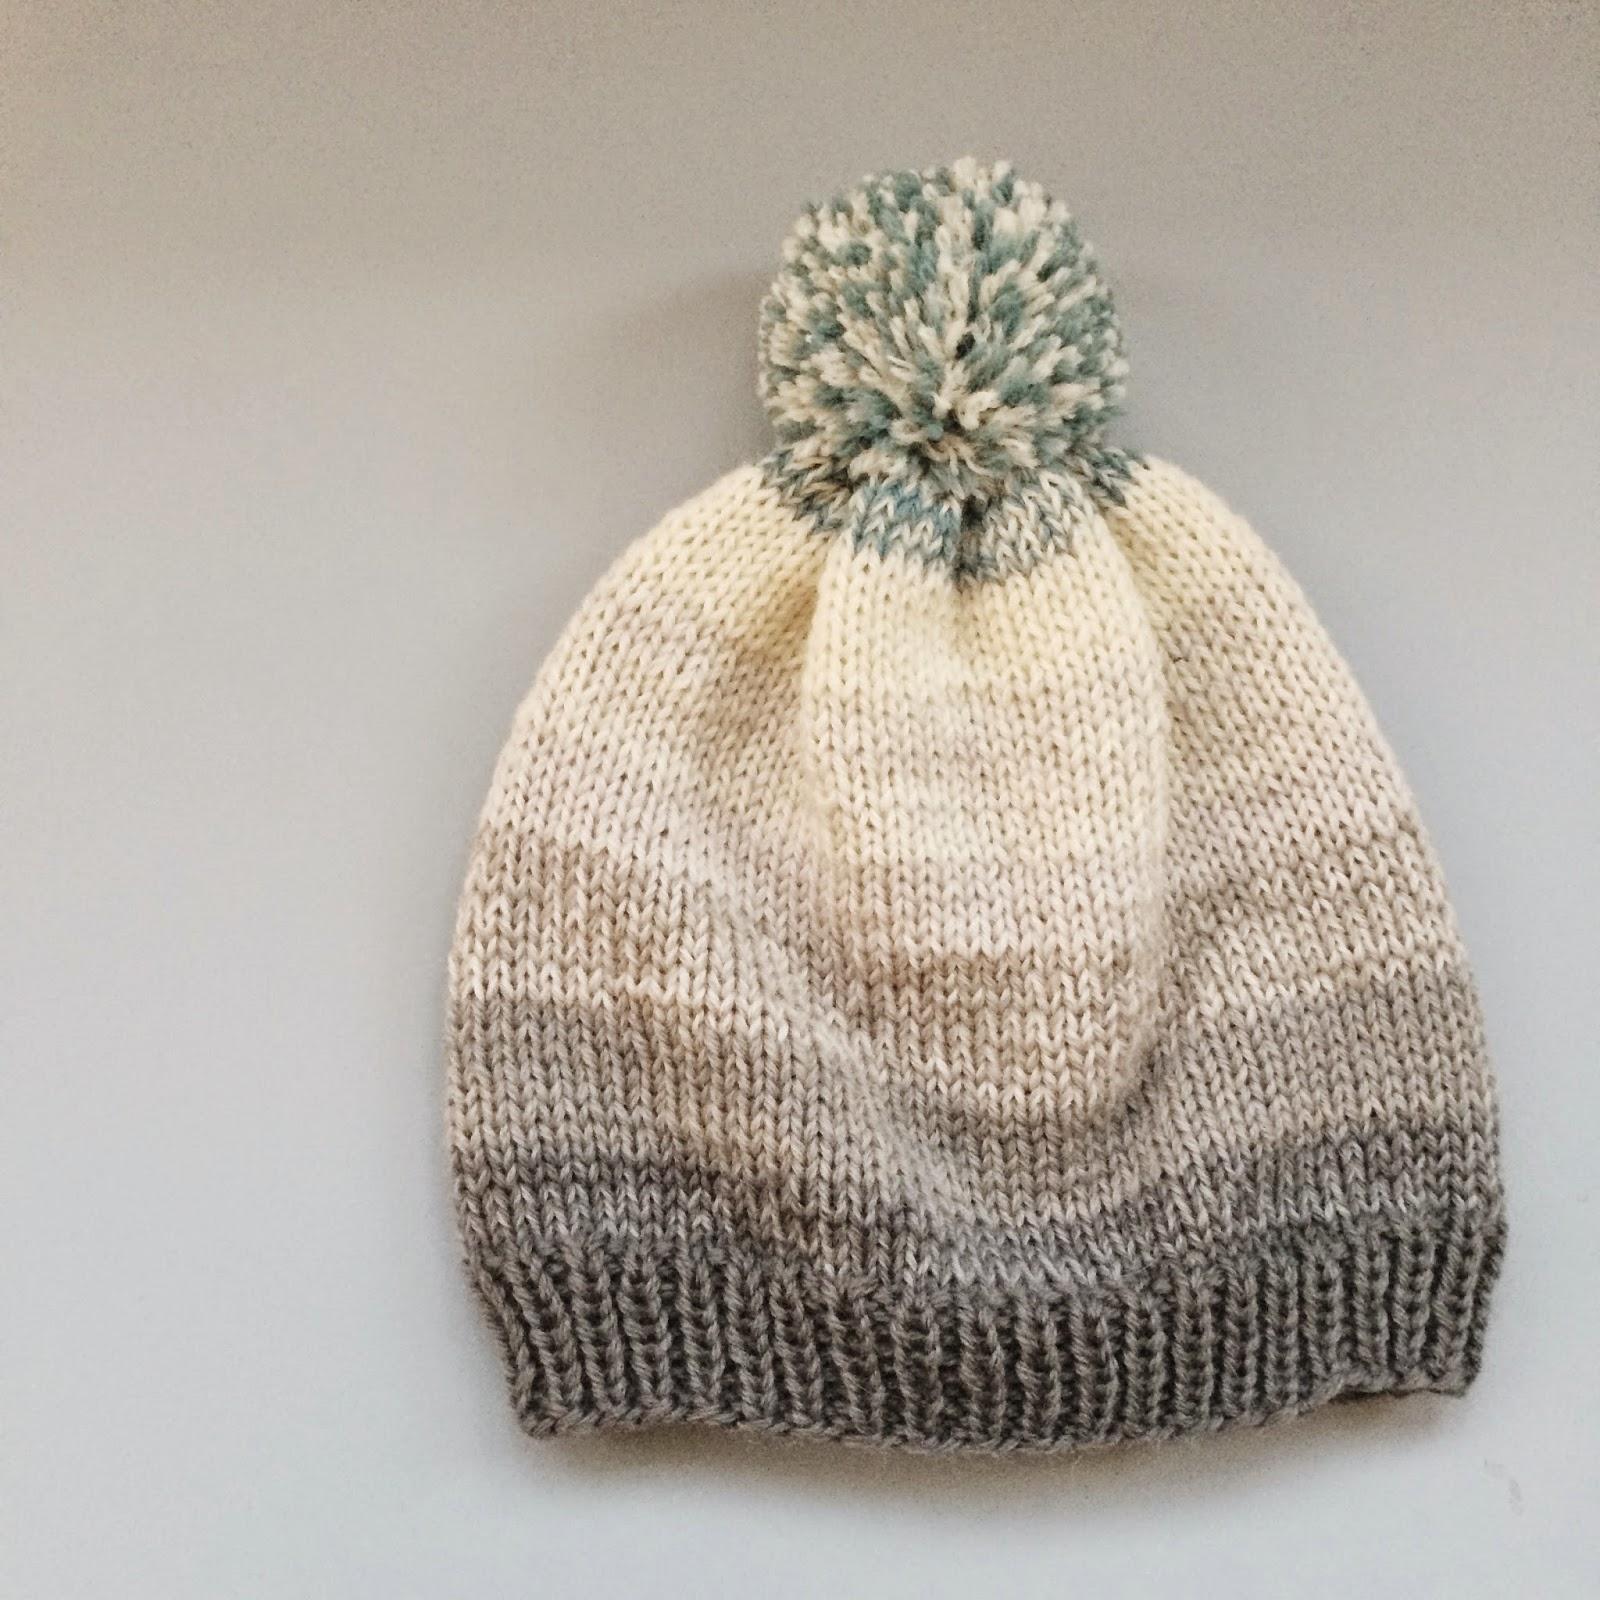 Bobs Beanie - free knitting pattern (in danish) from Meraki